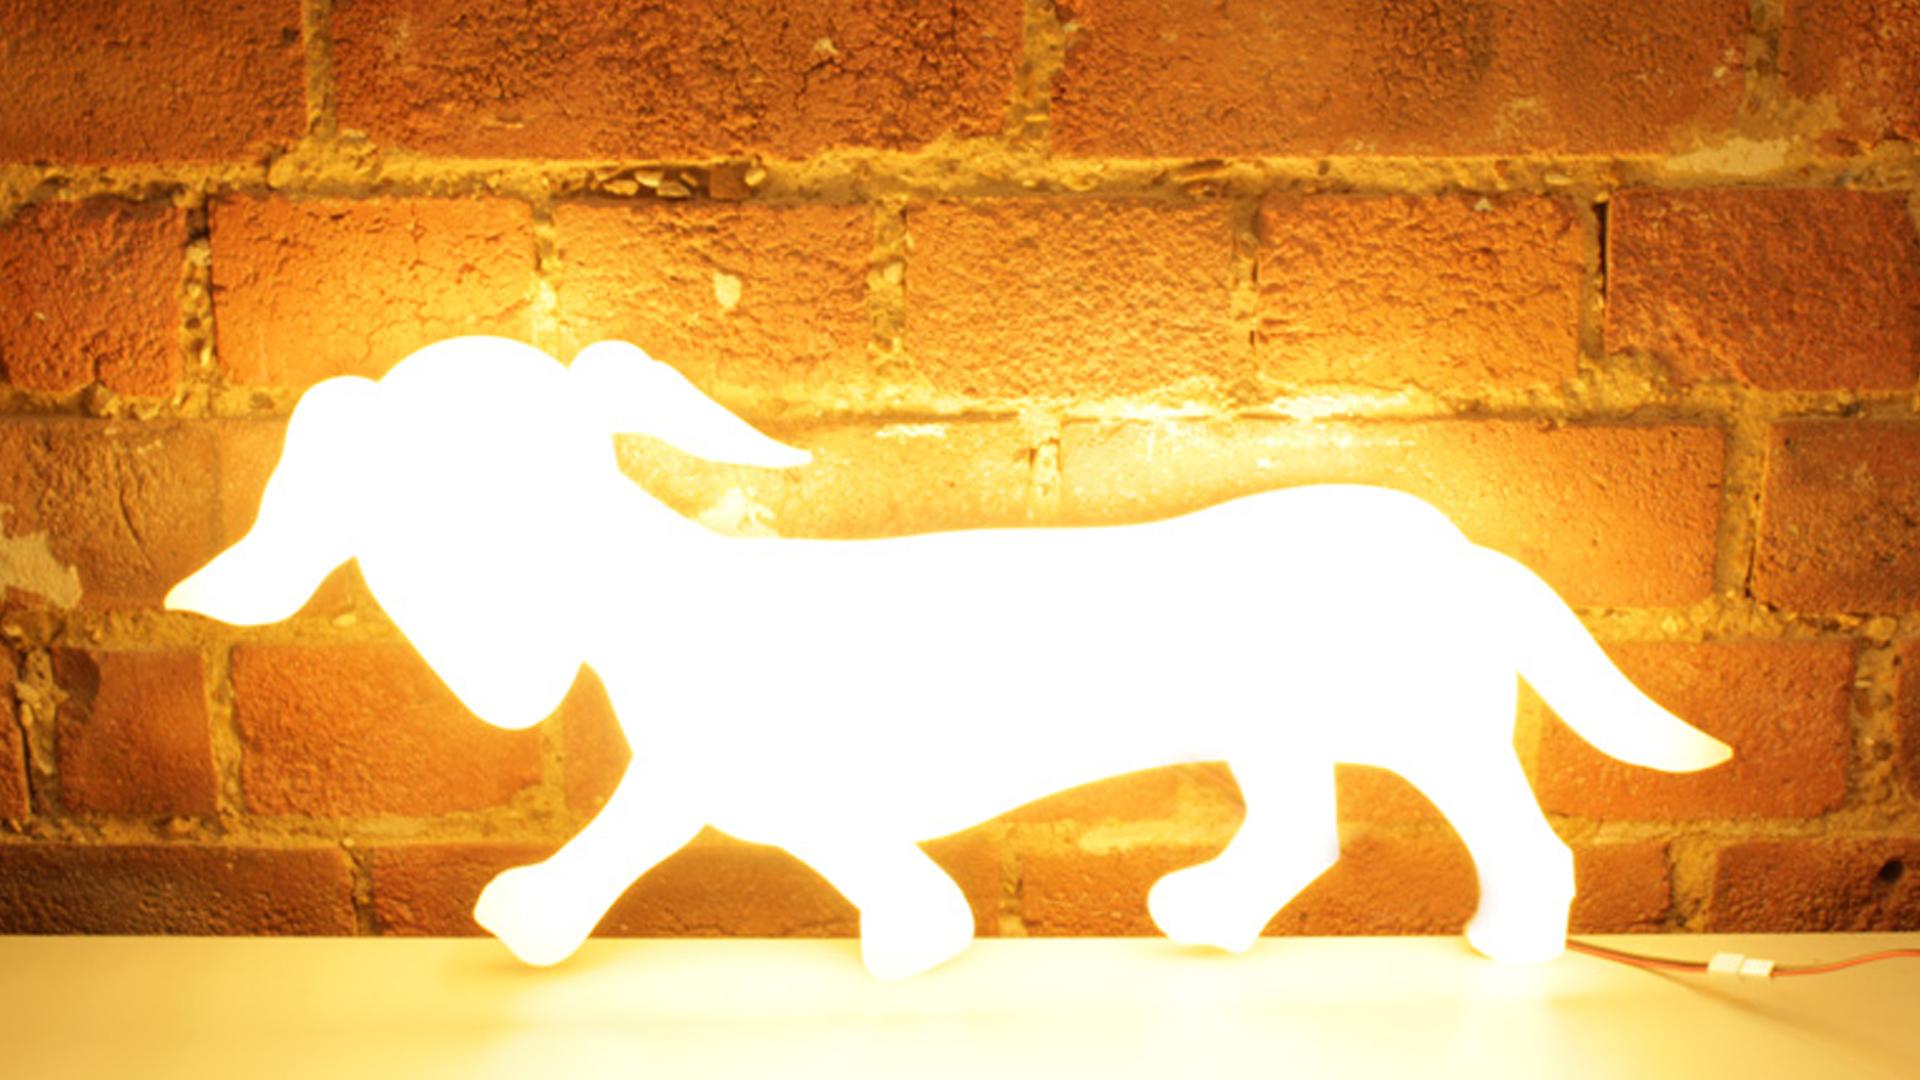 bespoke glowform shapes   the light lab